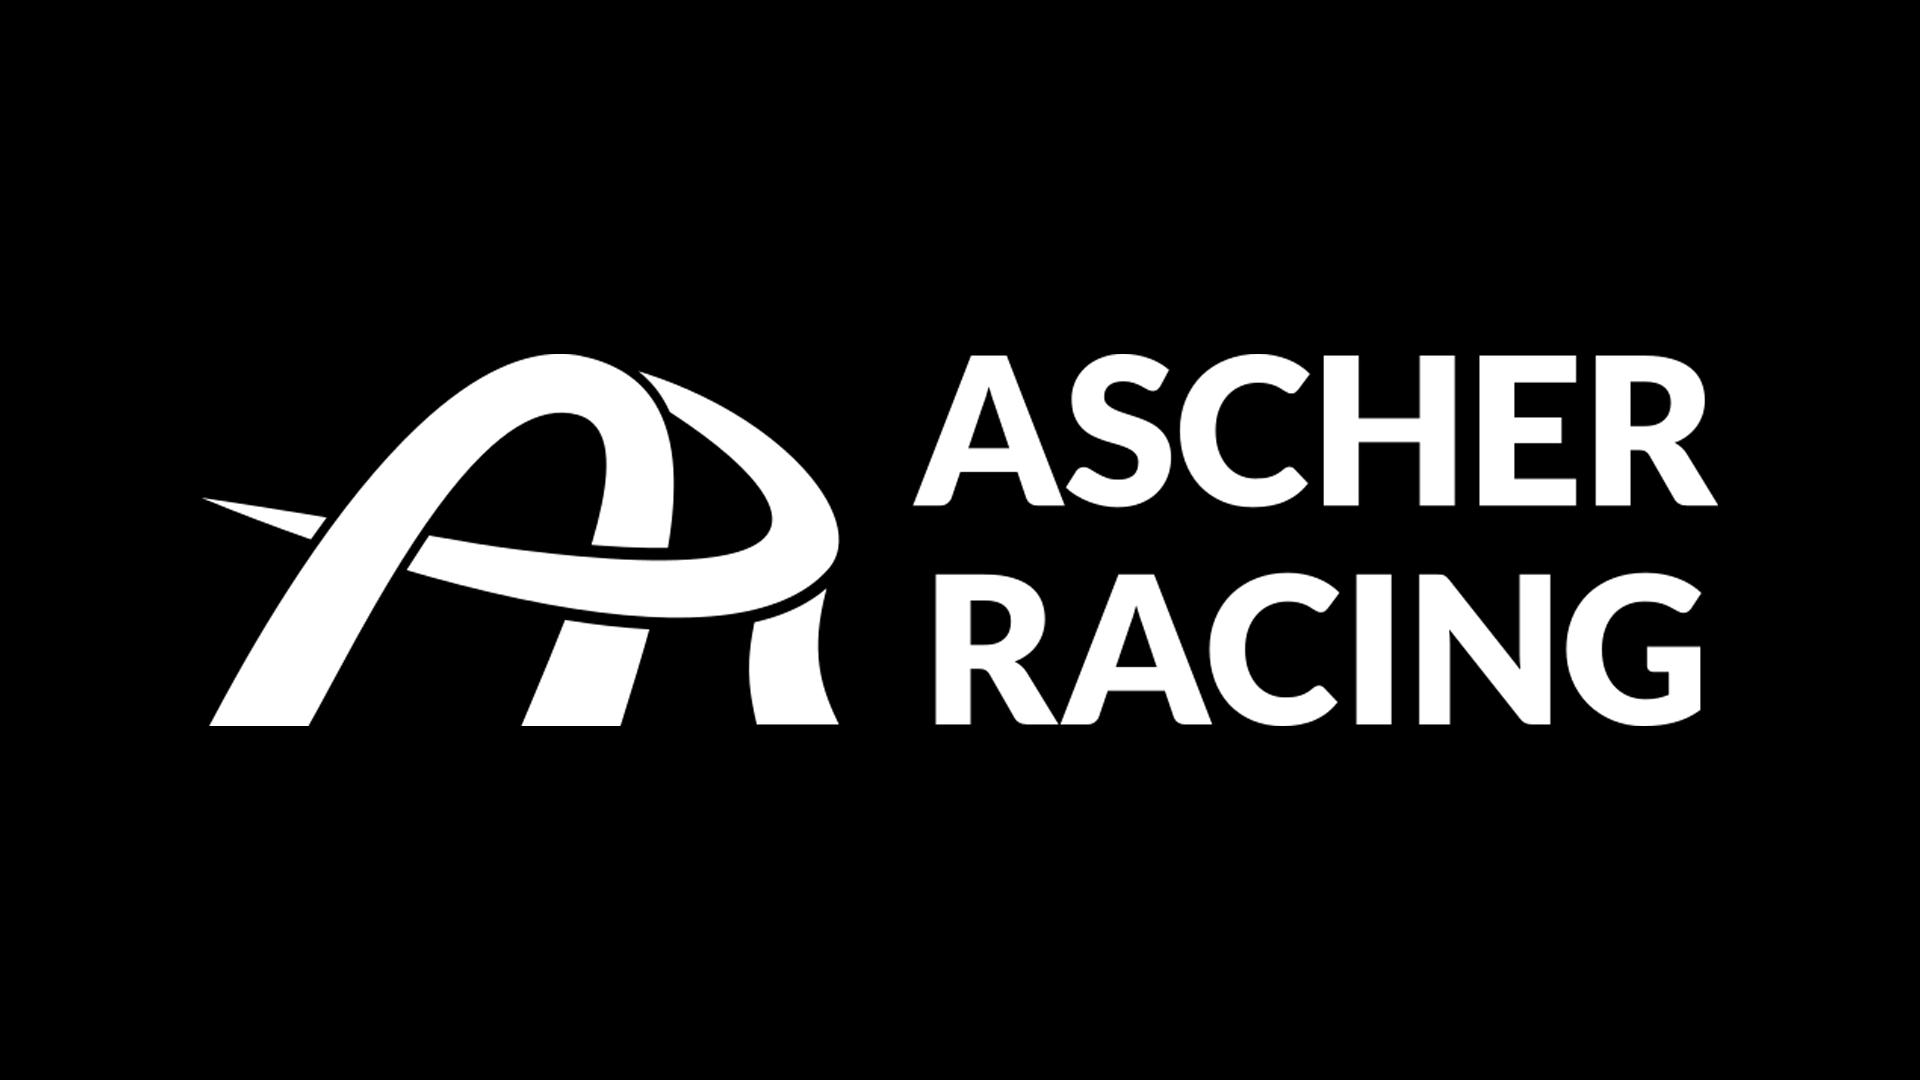 ascher-racing-logo.png